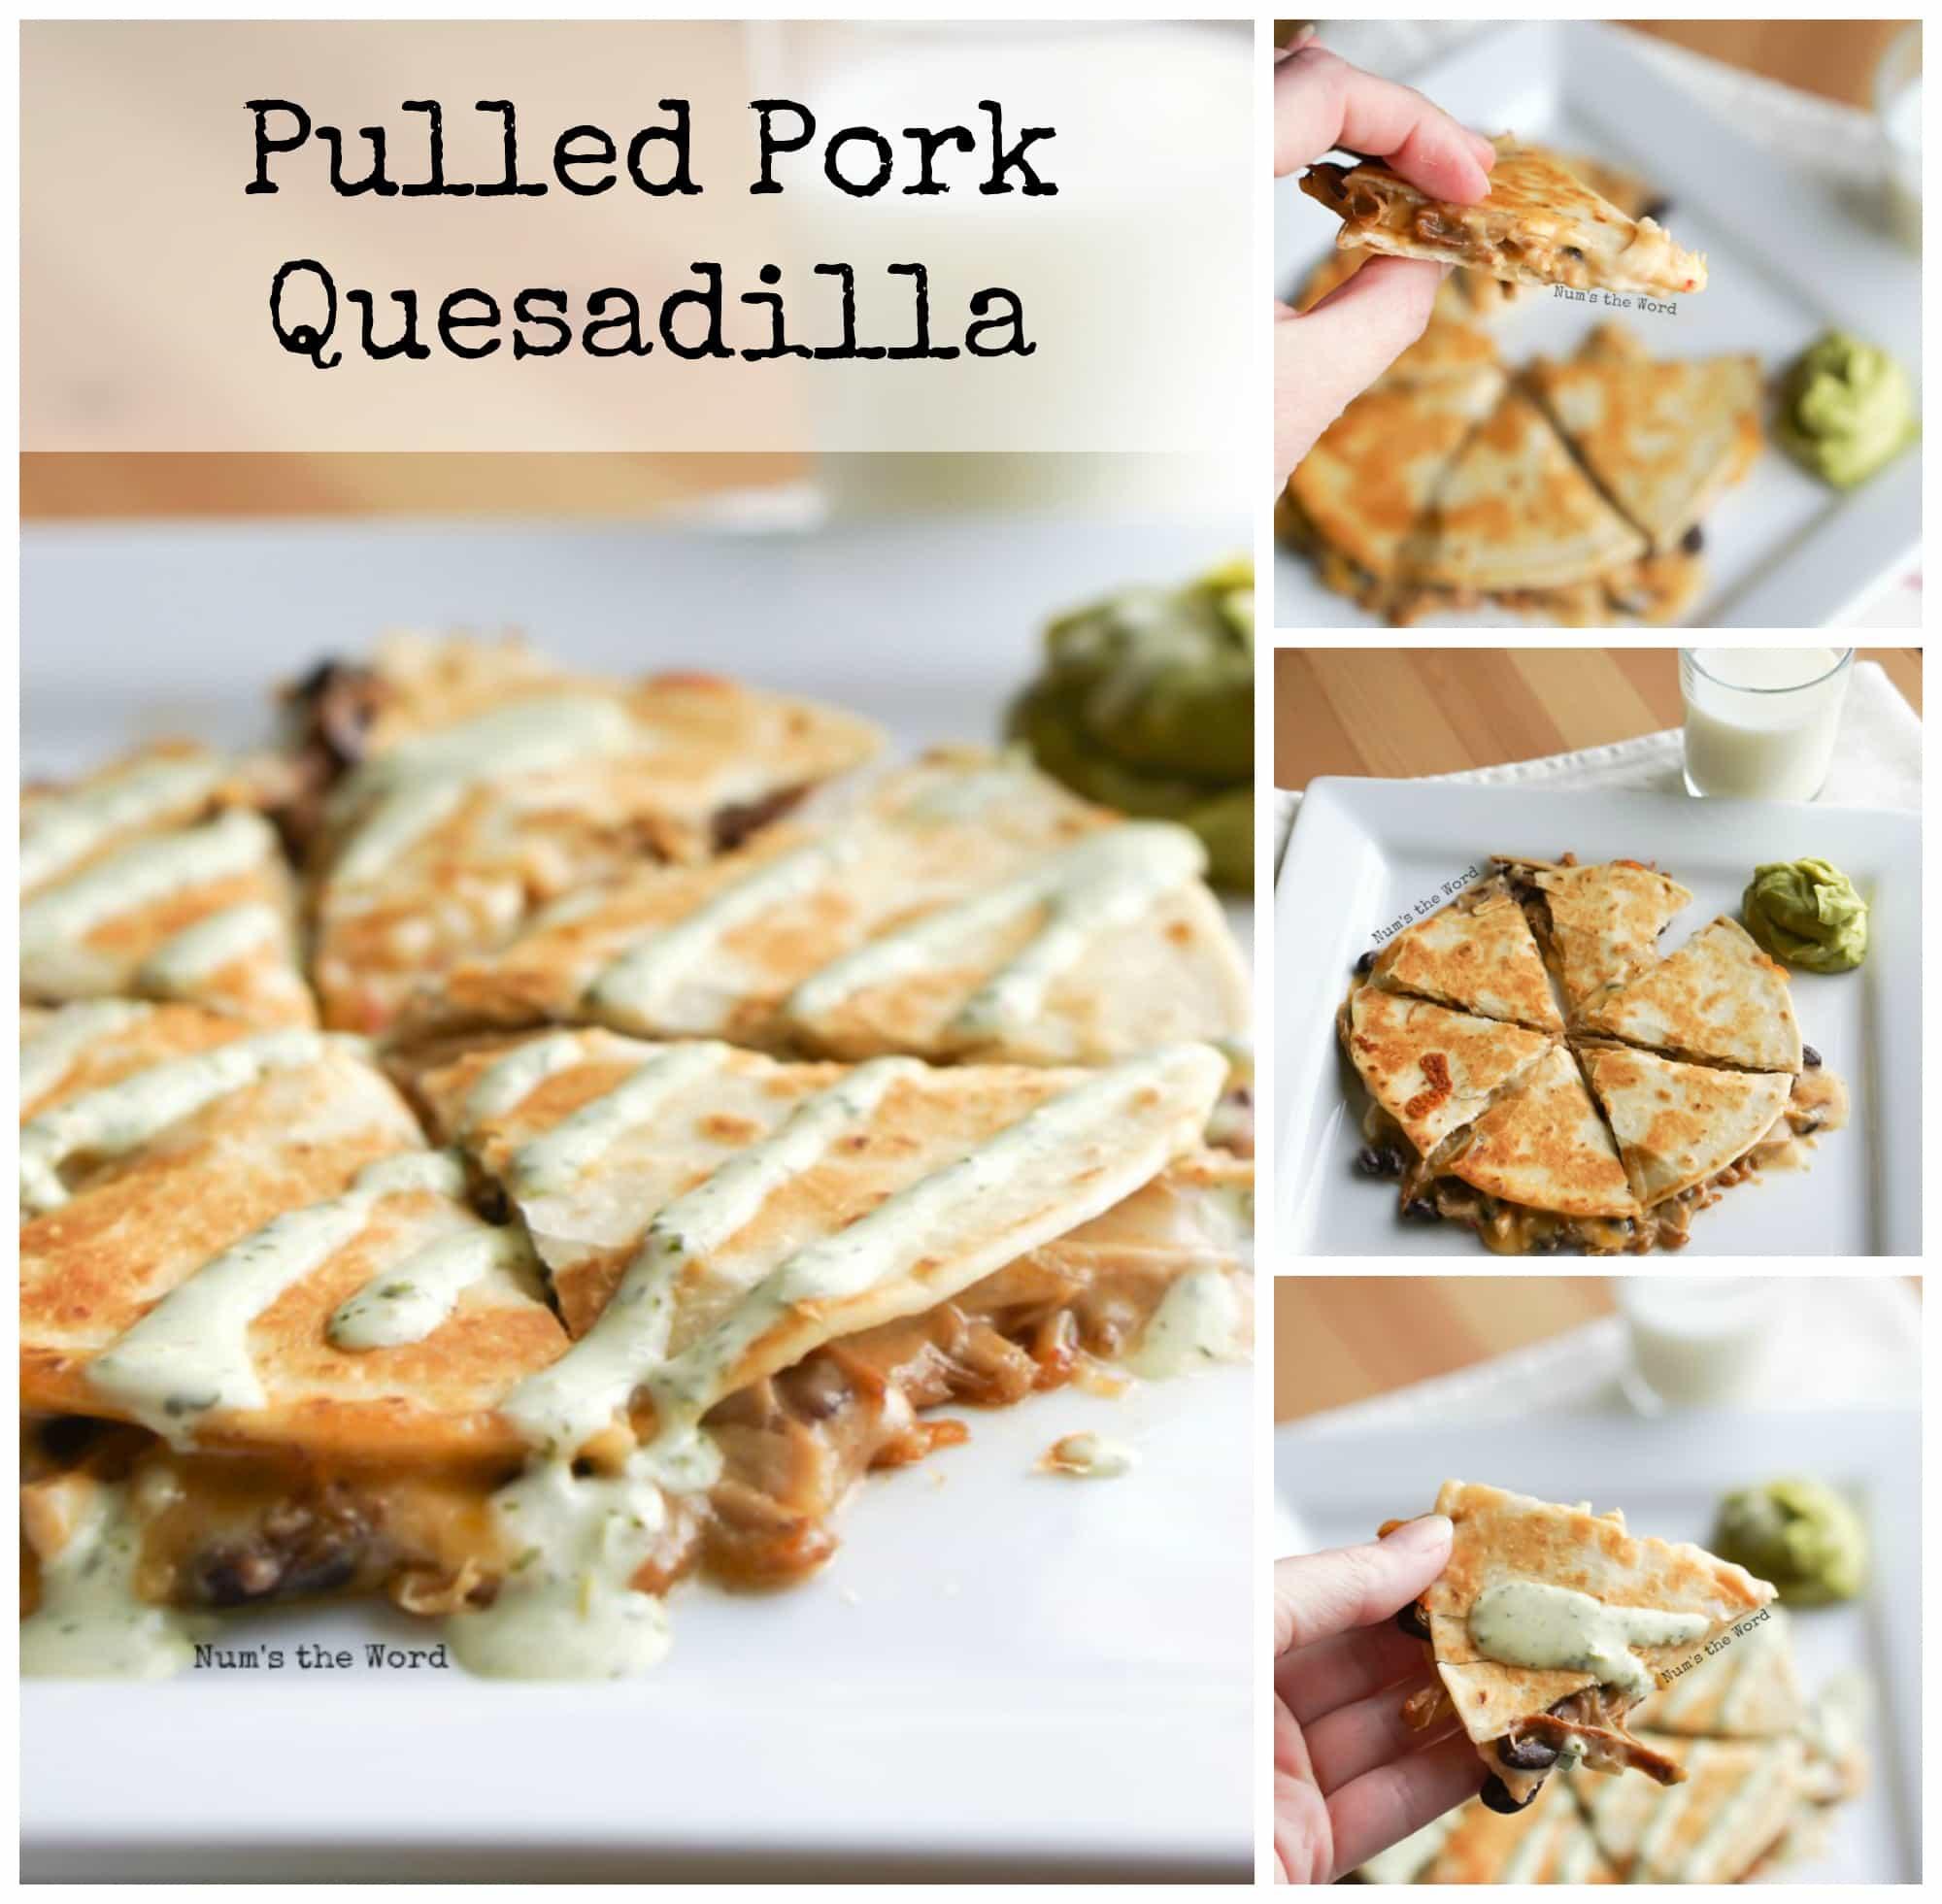 Pulled Pork Quesadilla - NumsTheWord